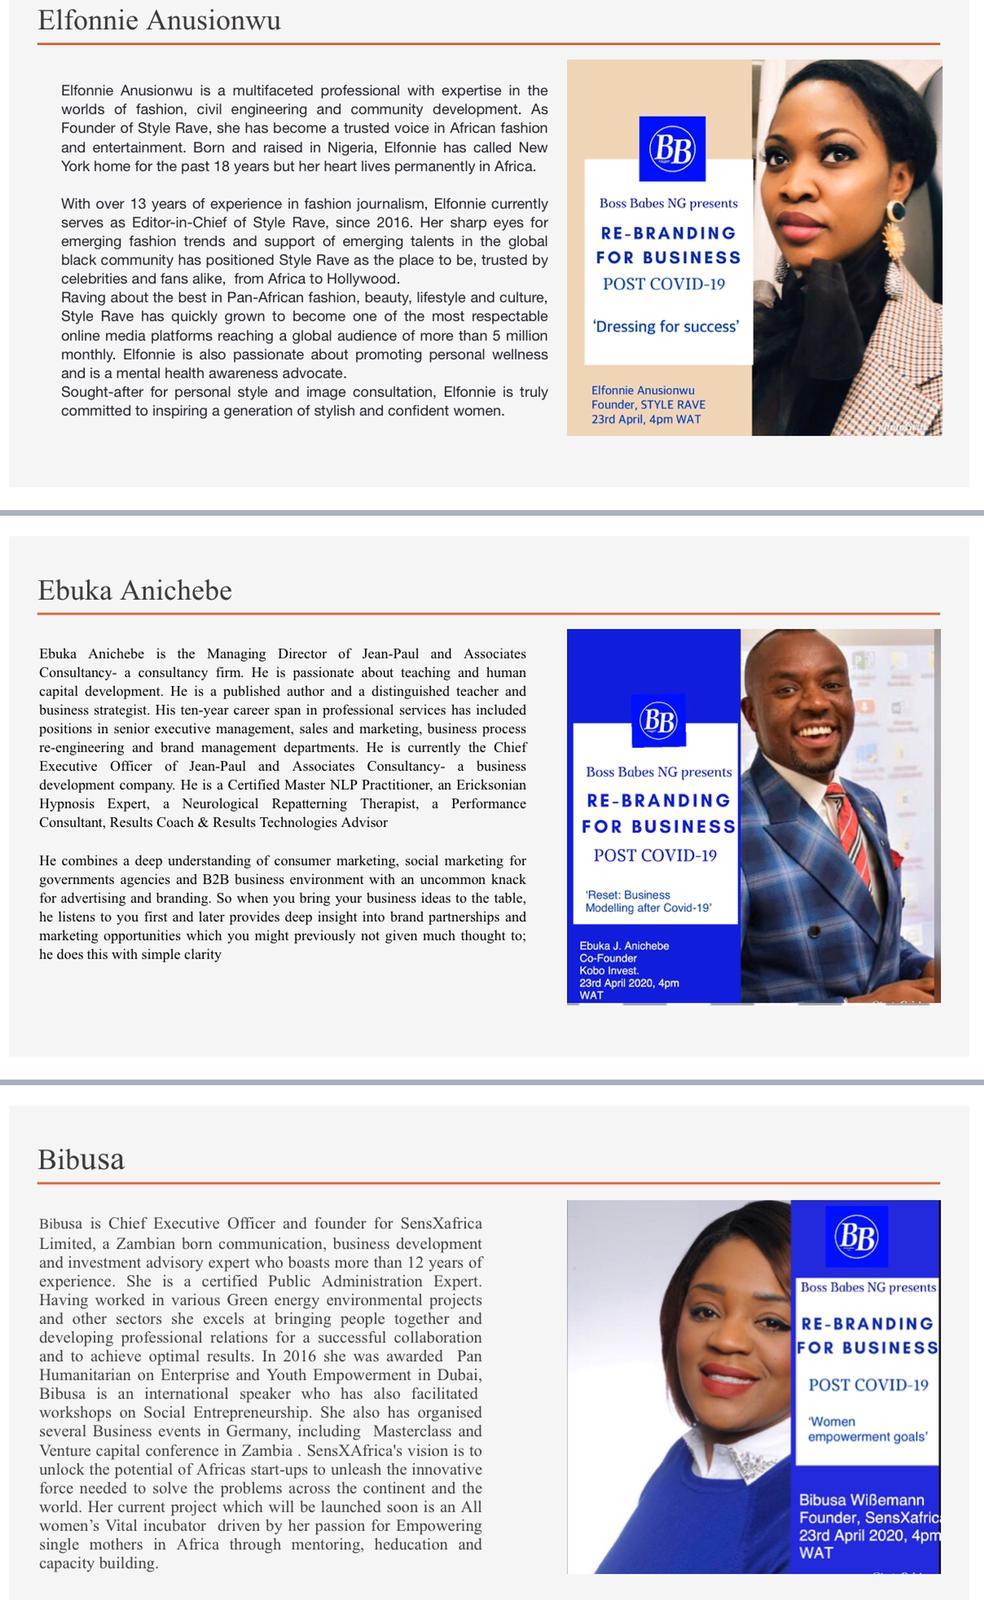 Elfonnie Ebuka Anichebe Bibusa Wibemann Rebranding for business post covid-19